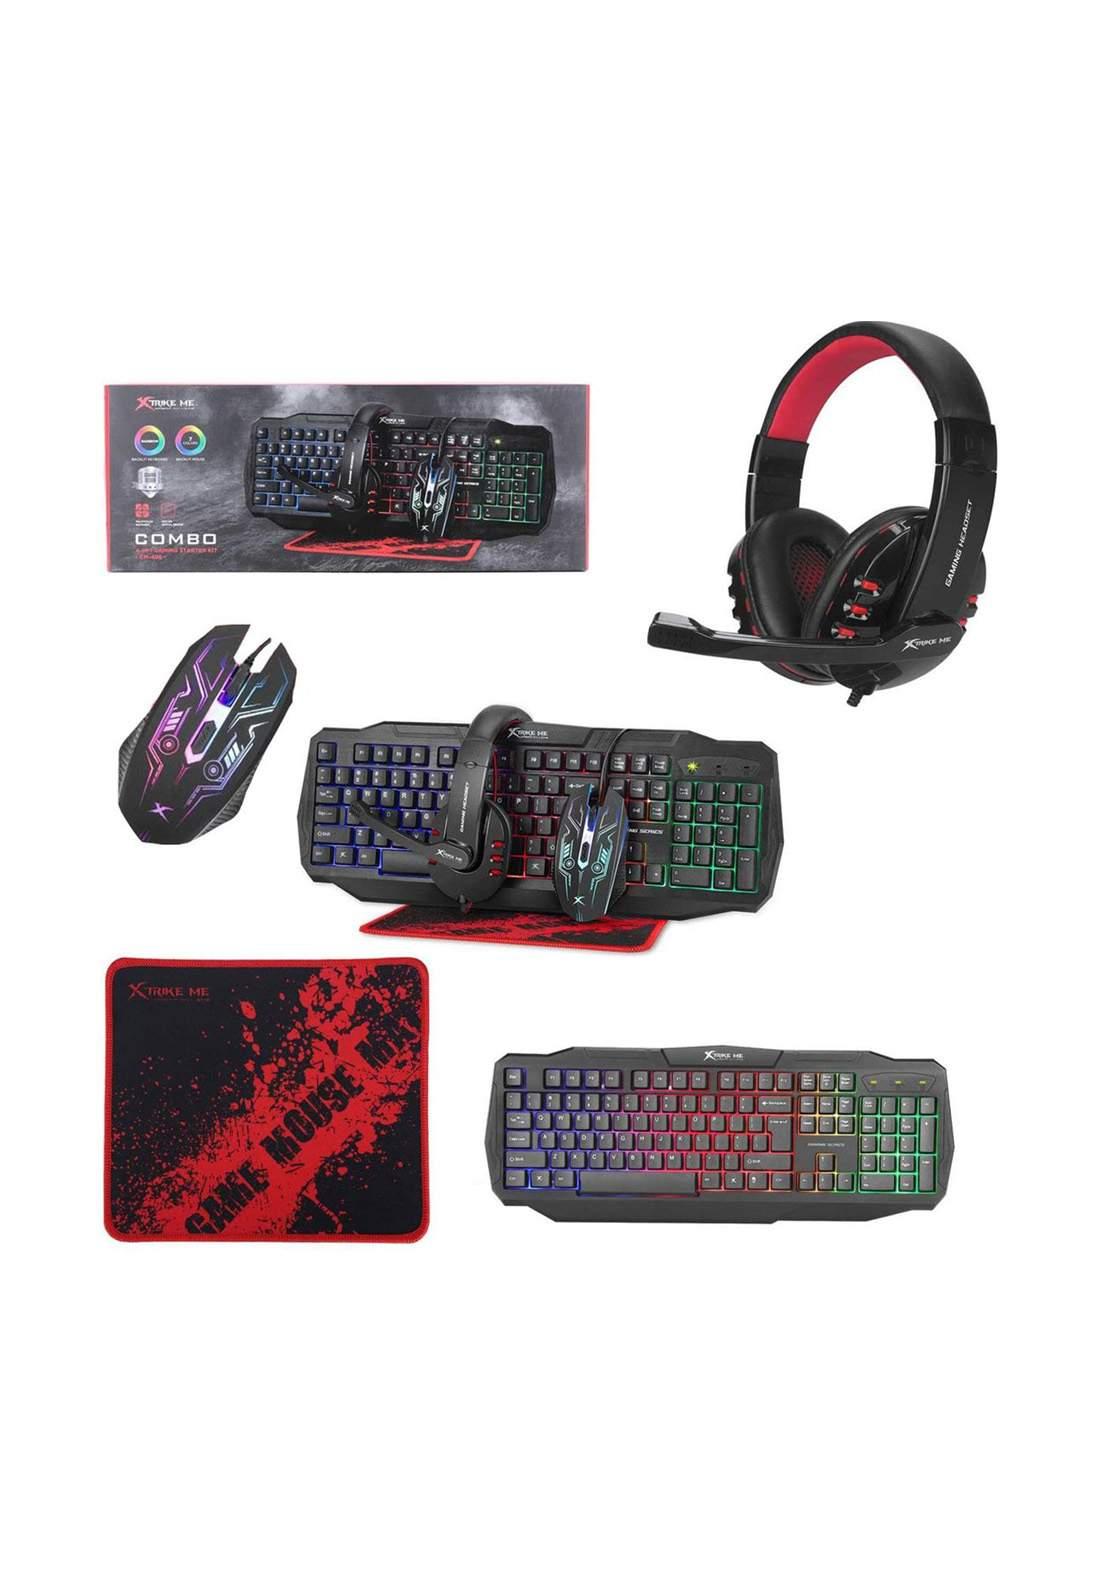 Xtrike ME CM-406 Gaming Combo 4 In 1